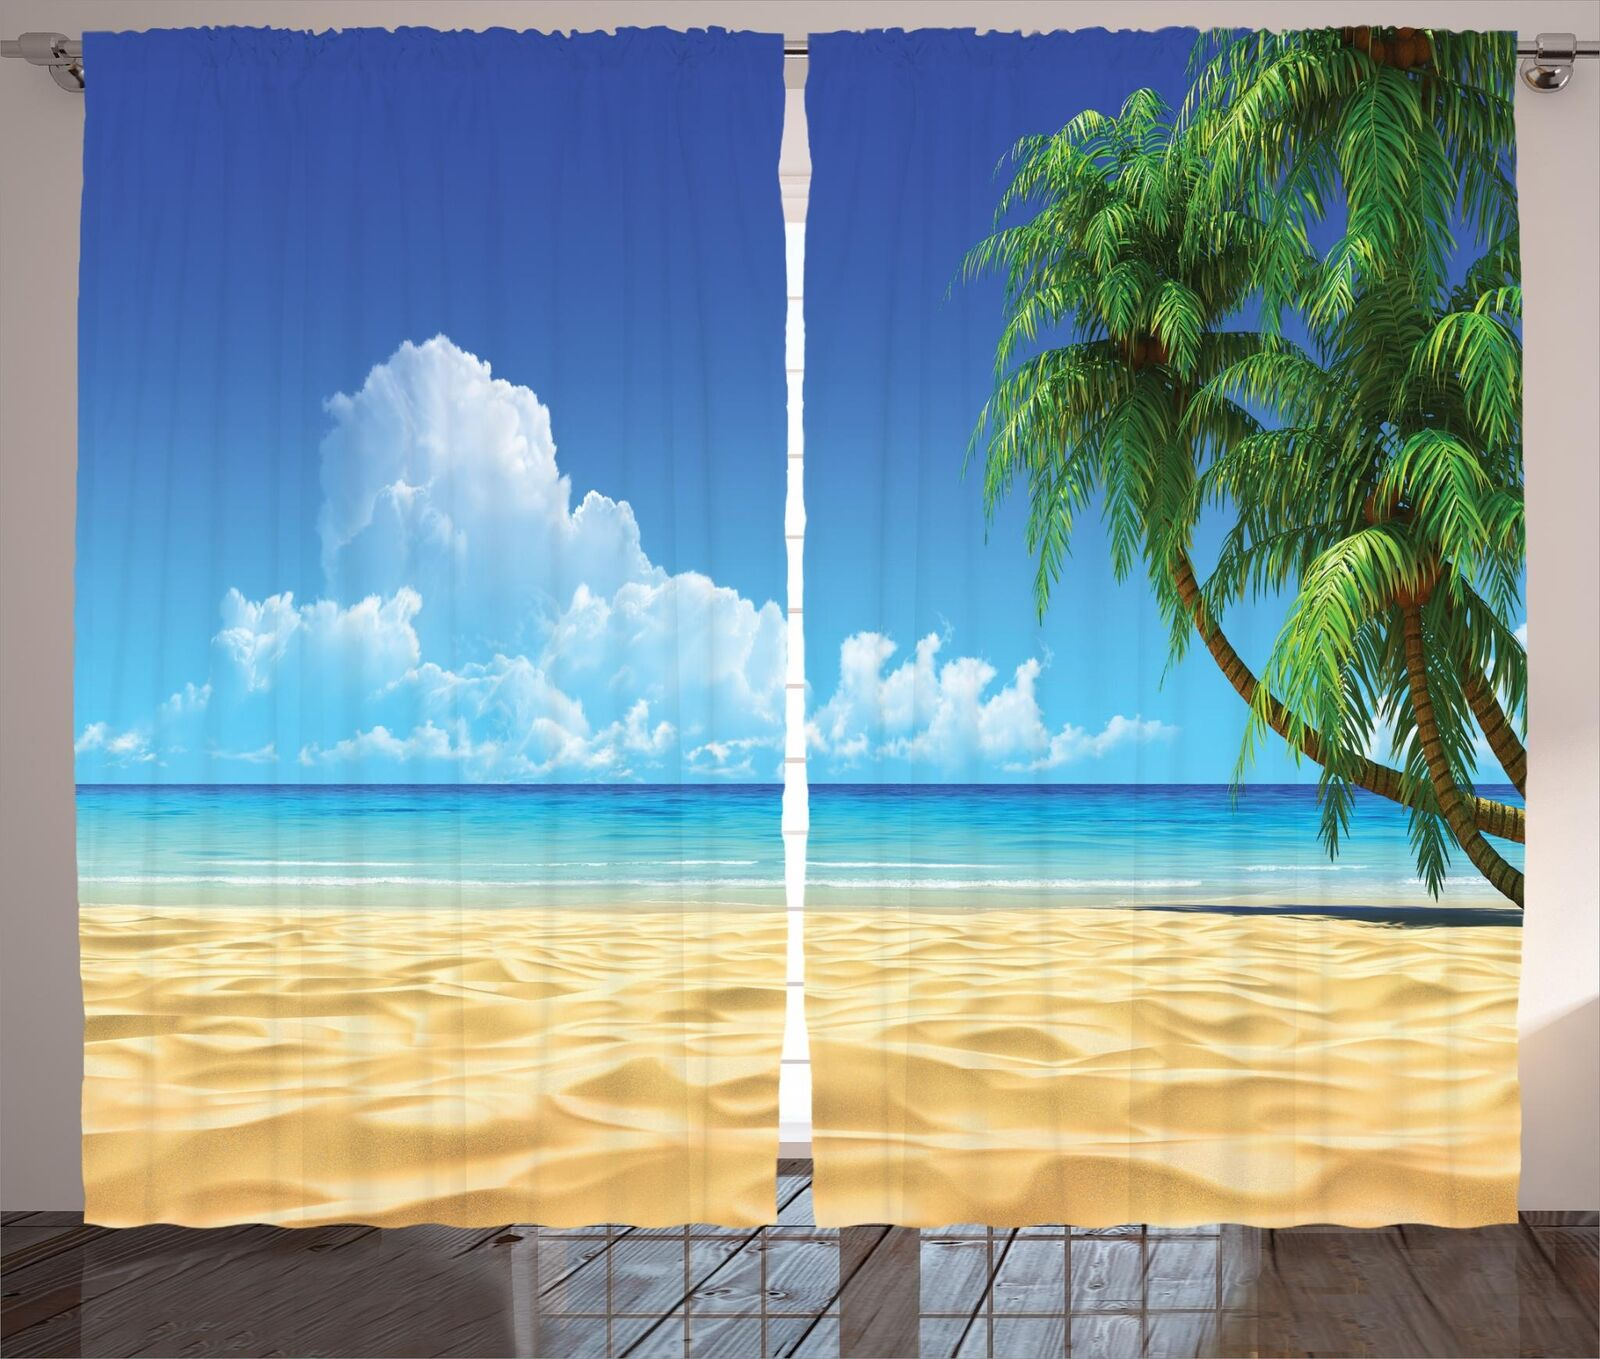 Palm Beach Curtains 2 Panel Set Decor 5 Größes Available Window Drapes